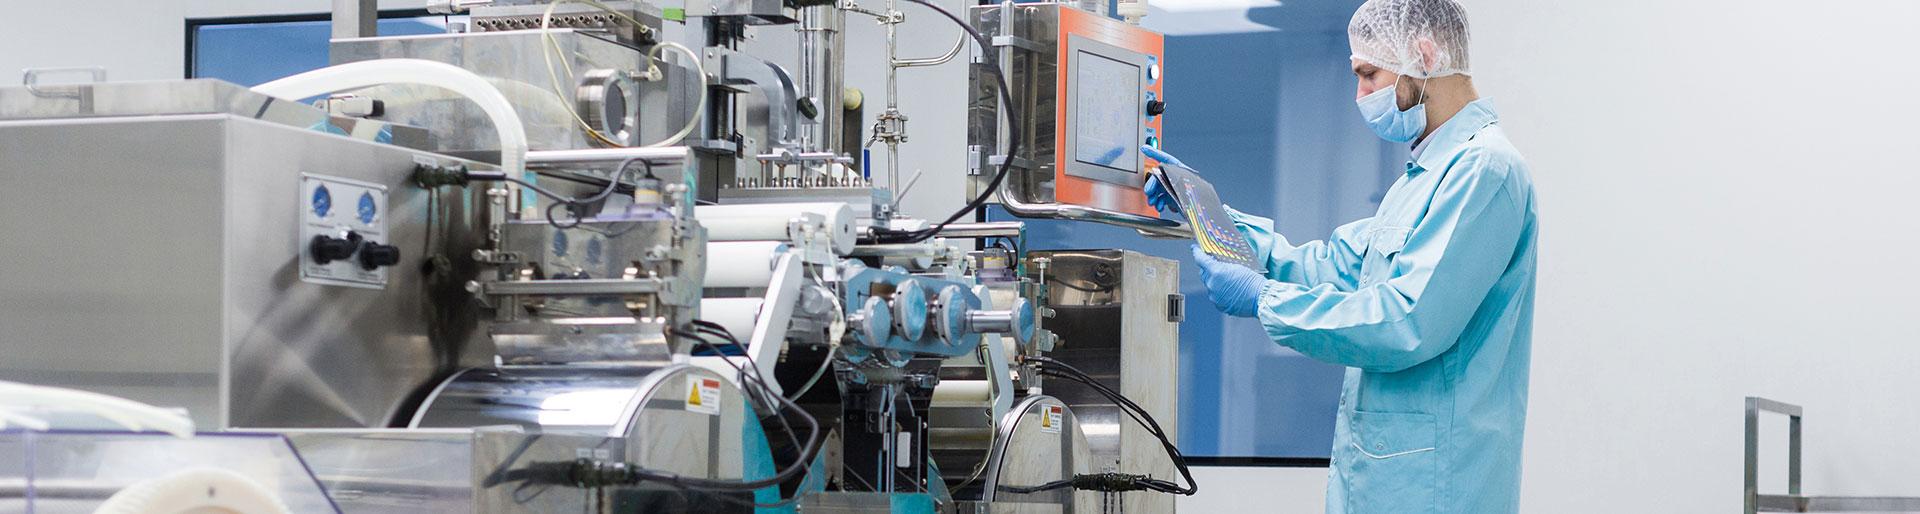 BP IA - Employé sur machine agroalimentaire